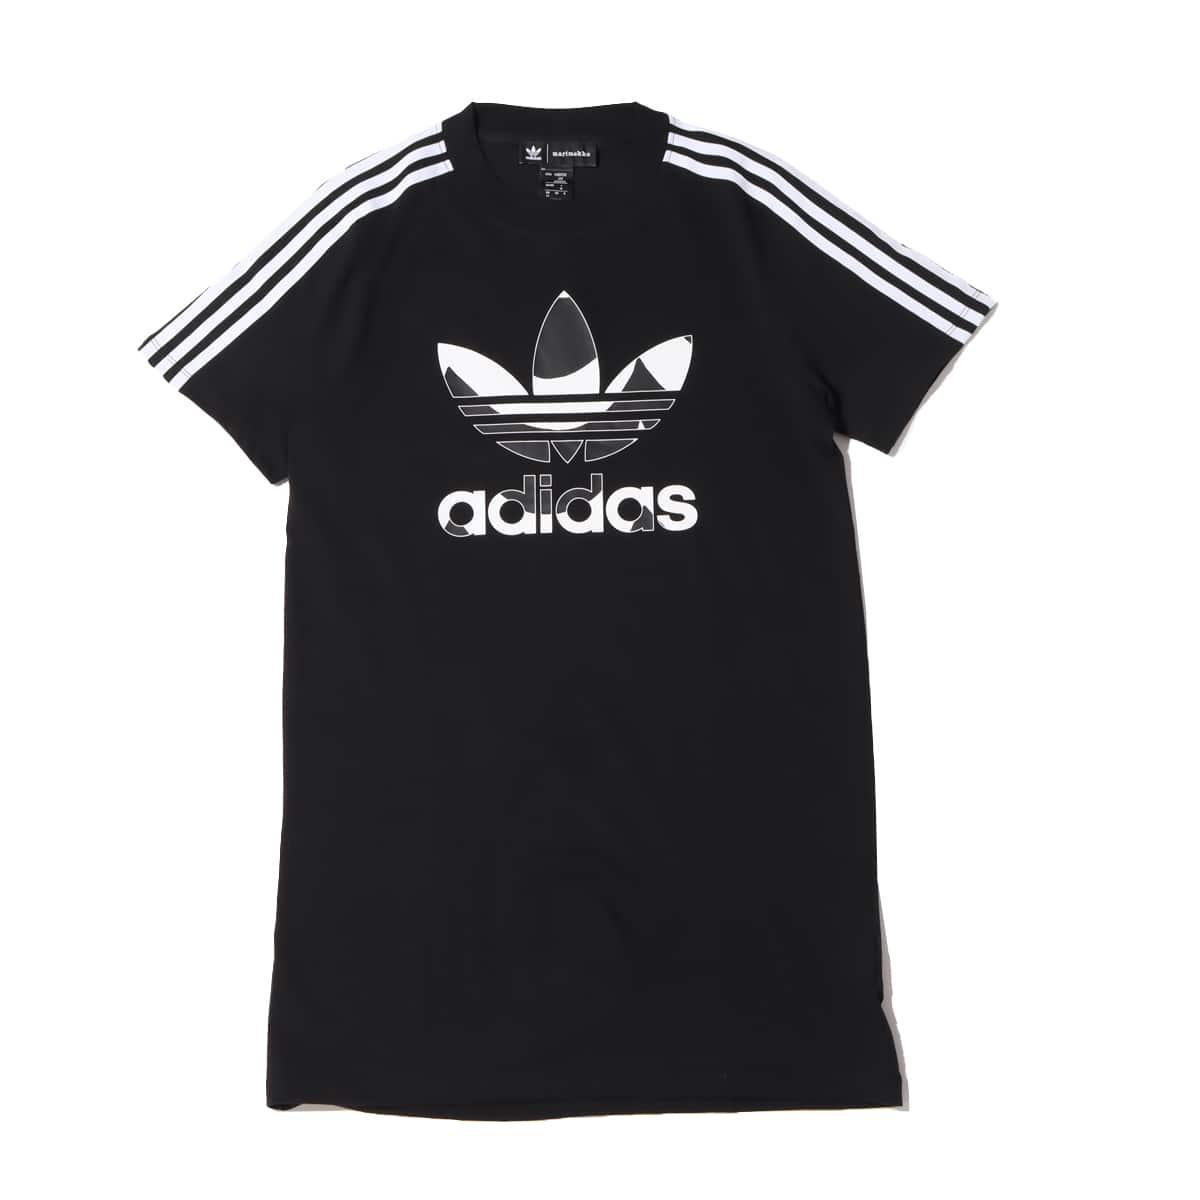 adidas Marimekko TEE DRESS BLACK 21FW-I_photo_large